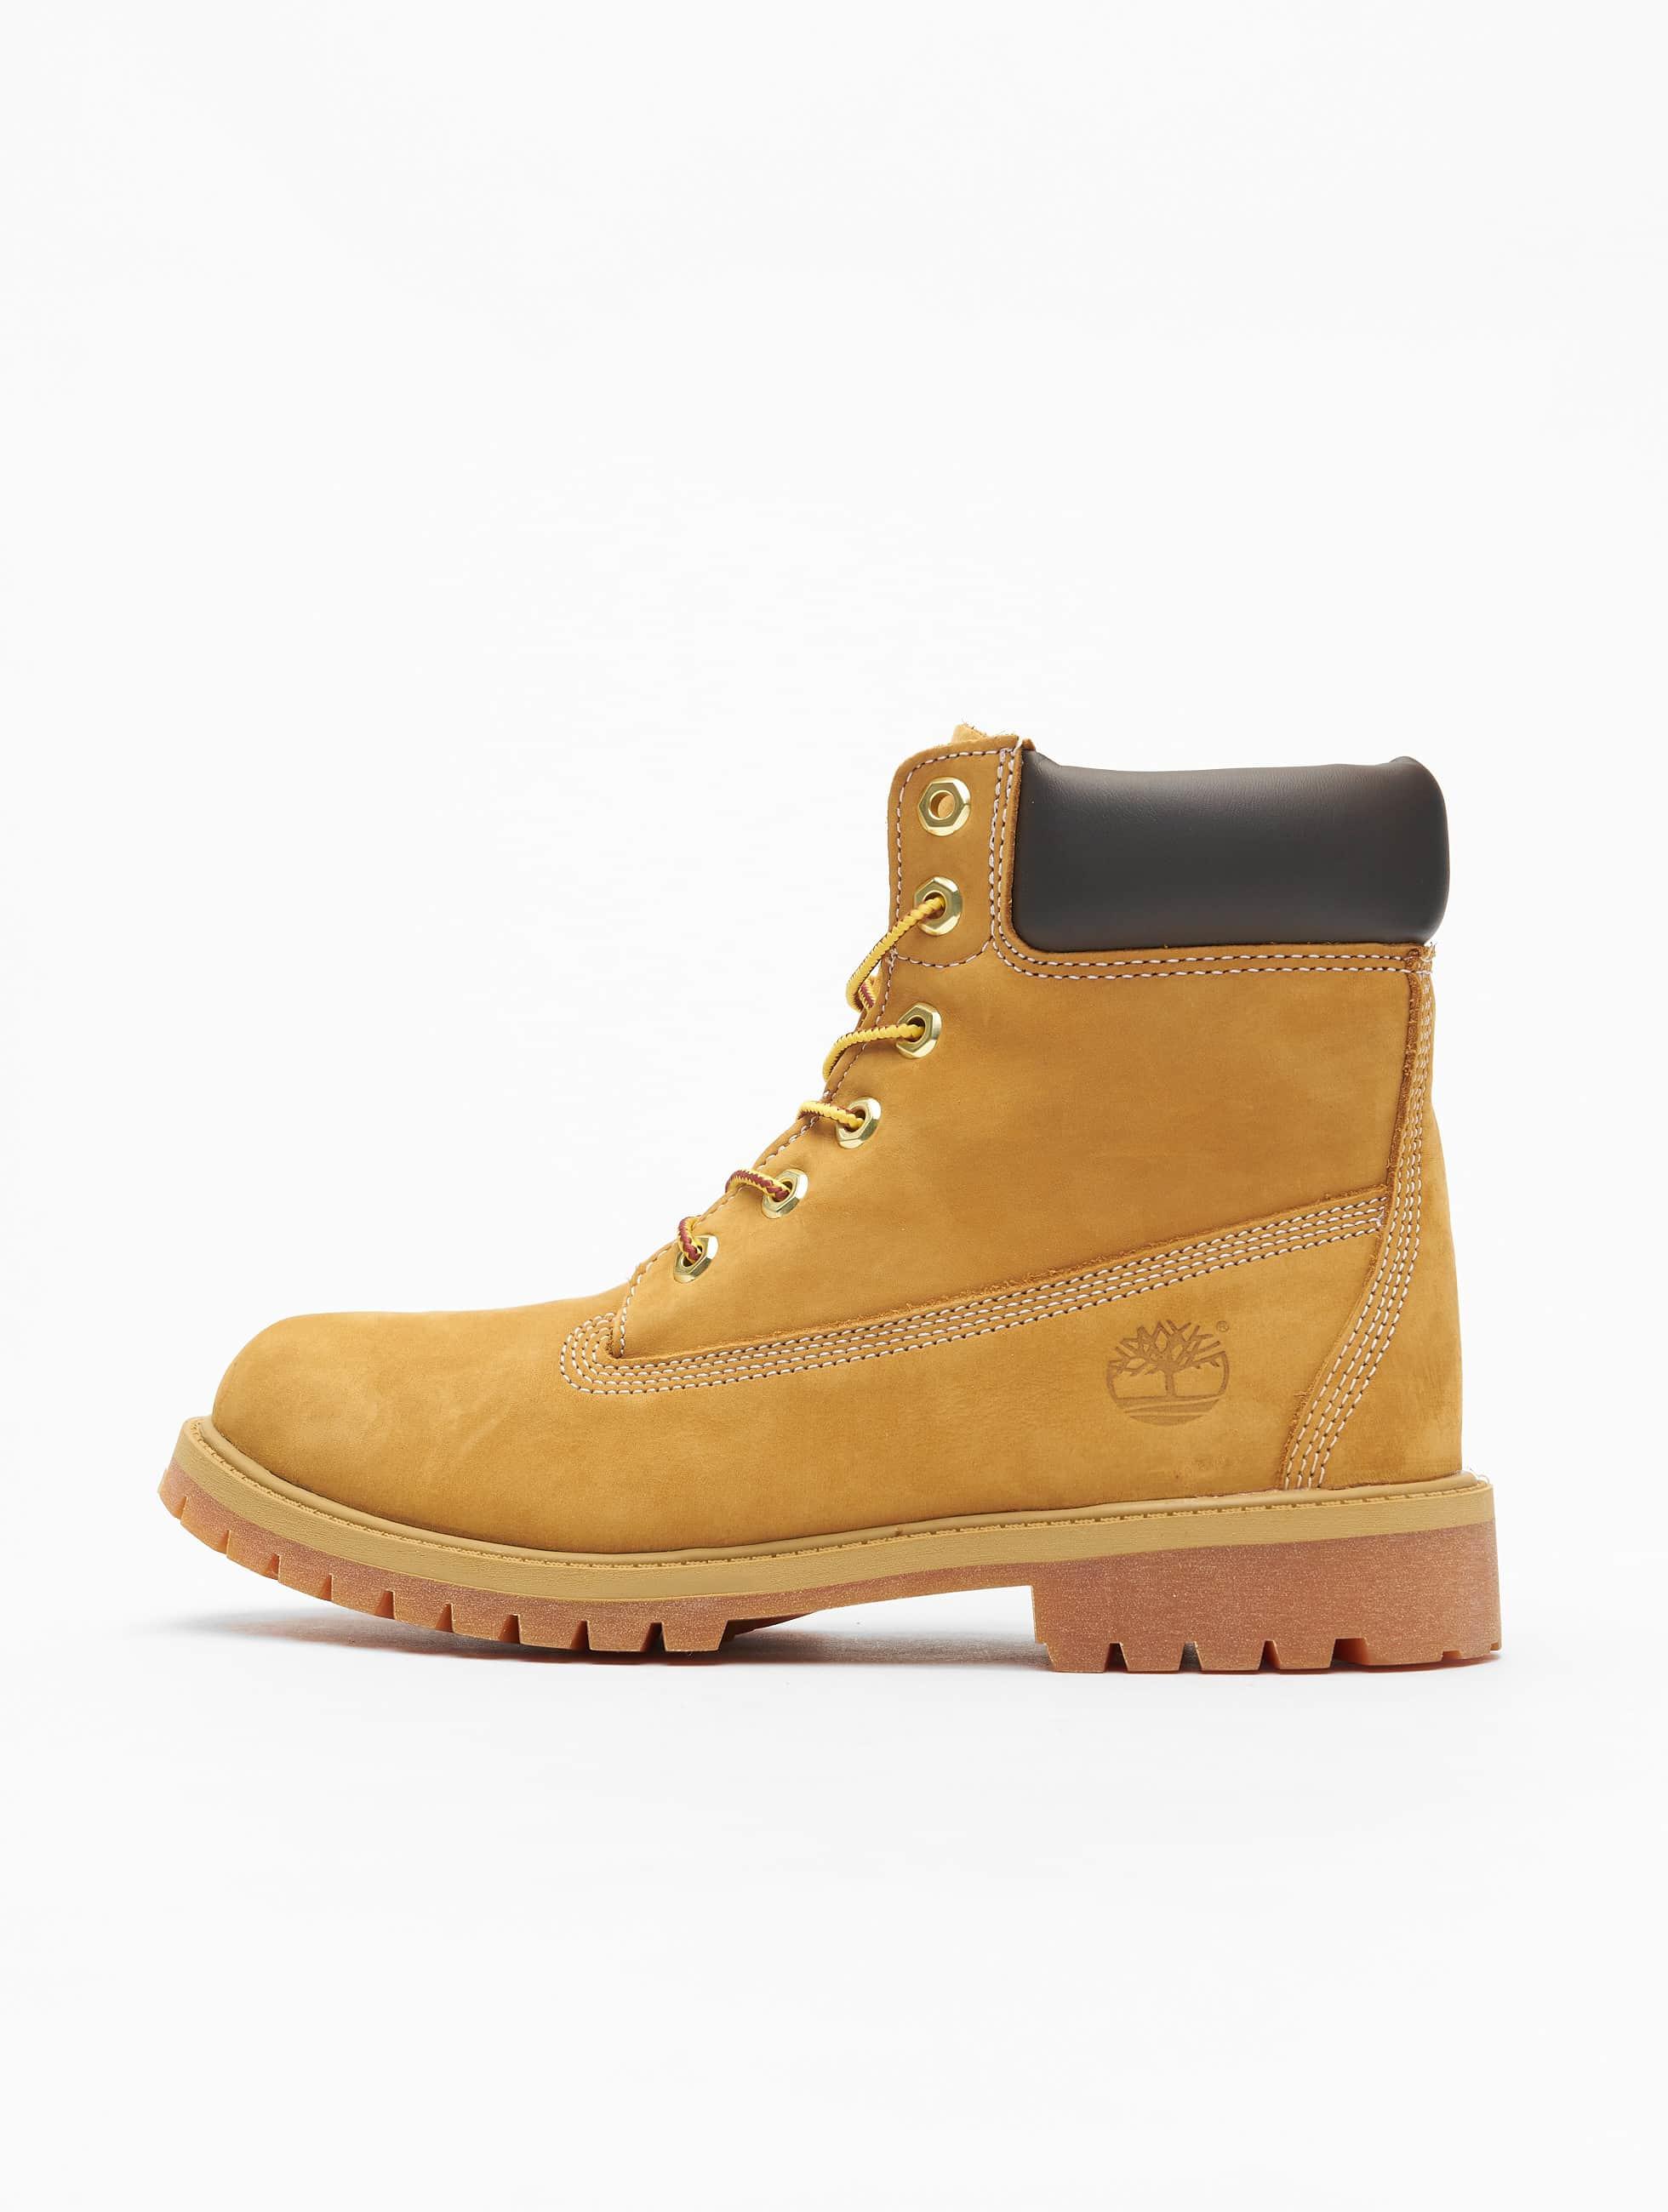 Boots 6 In Premium in braun